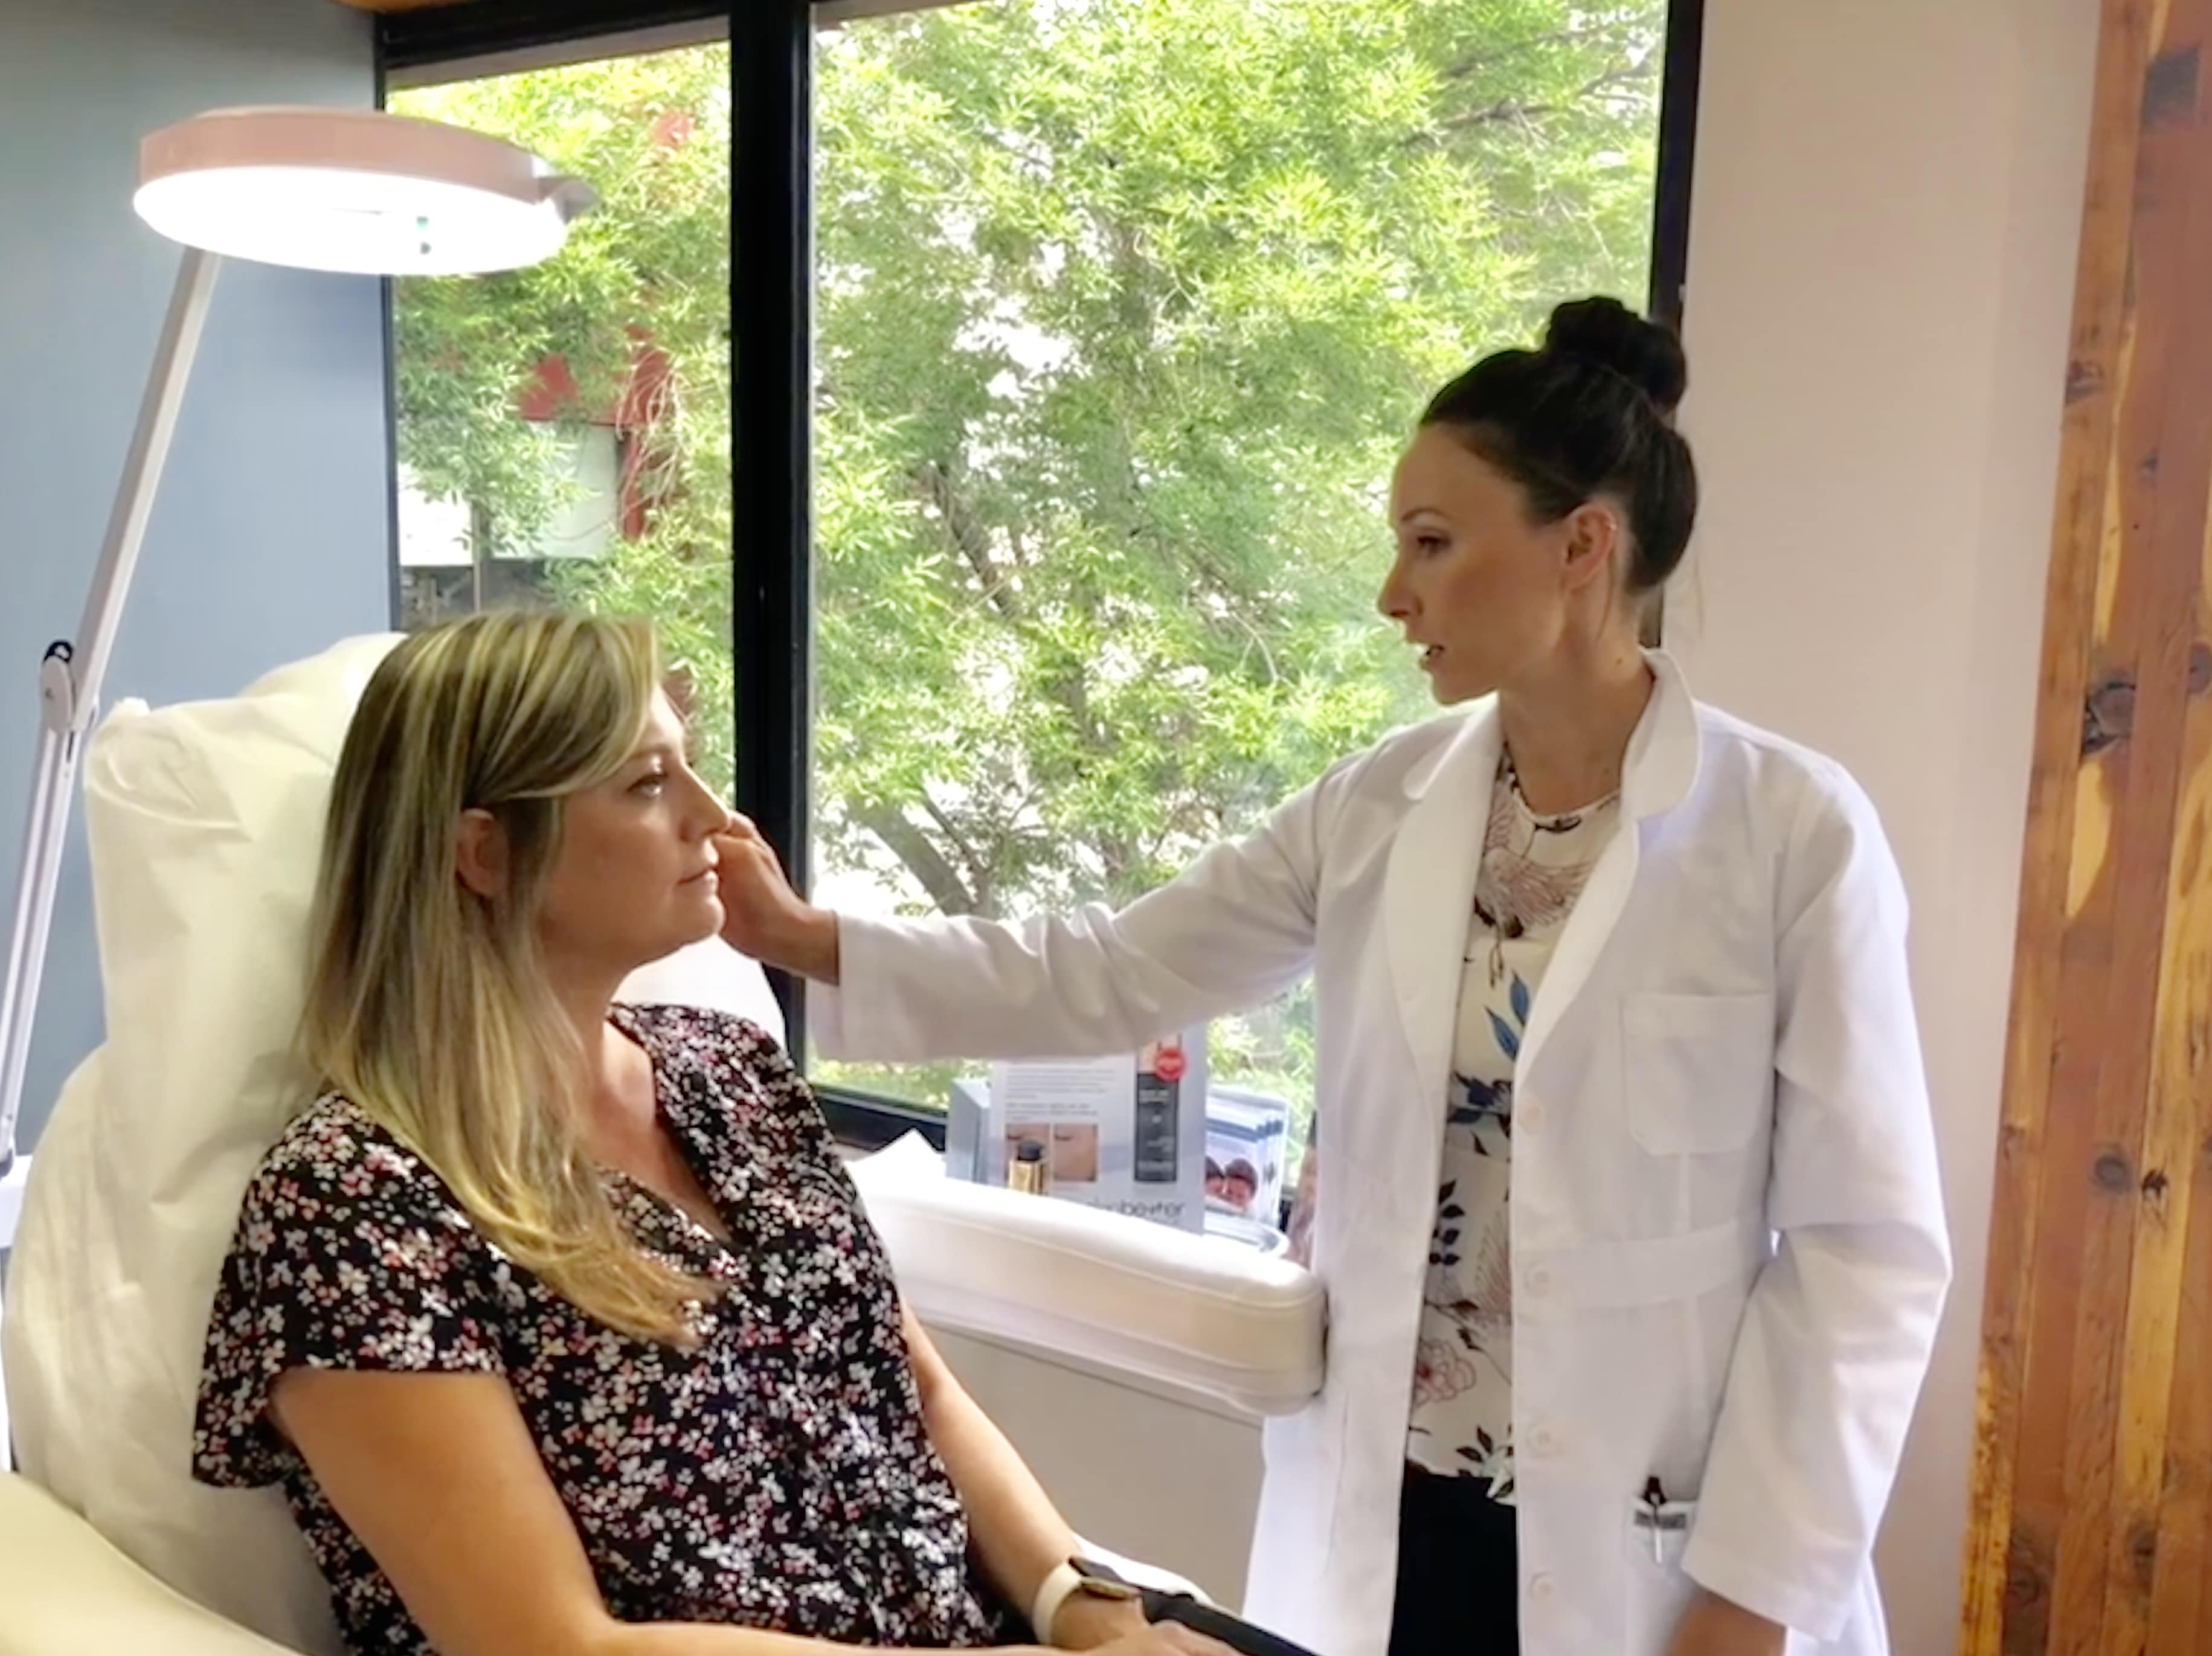 Consult with Elite Medical & Aesthetics